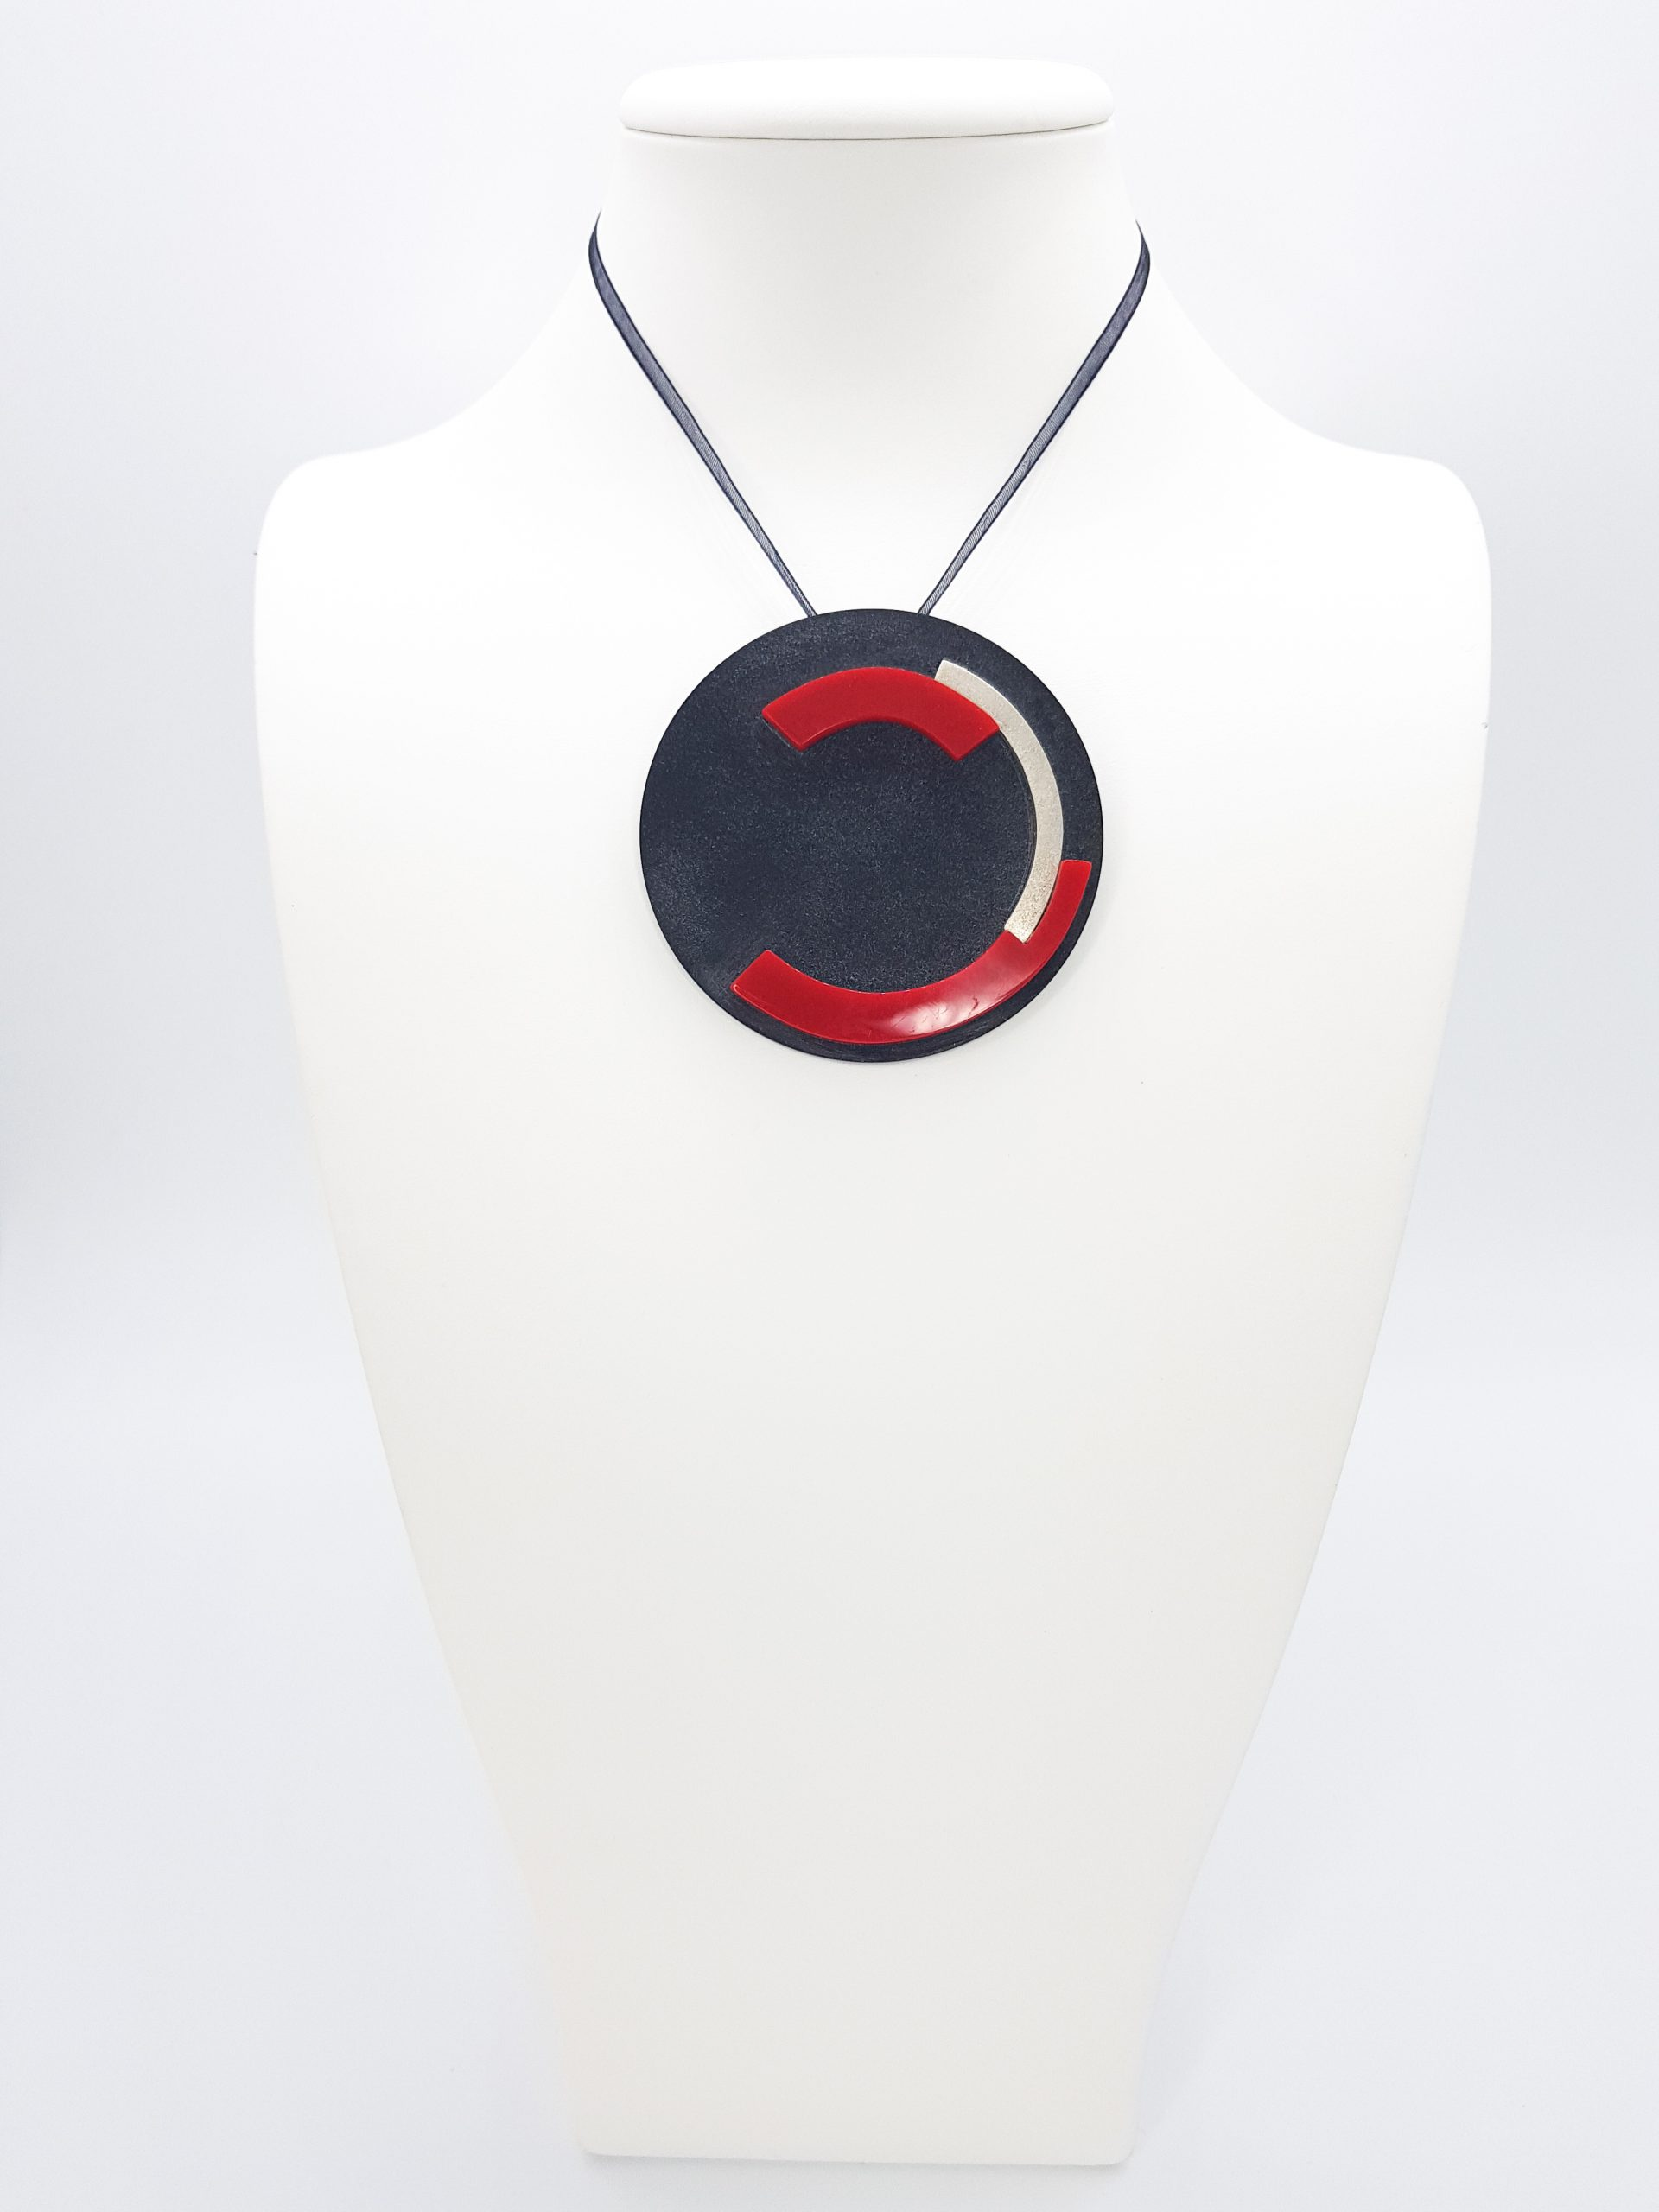 Broche geométrico Negro, Rojo y Plata, redondo, de KiKKO.